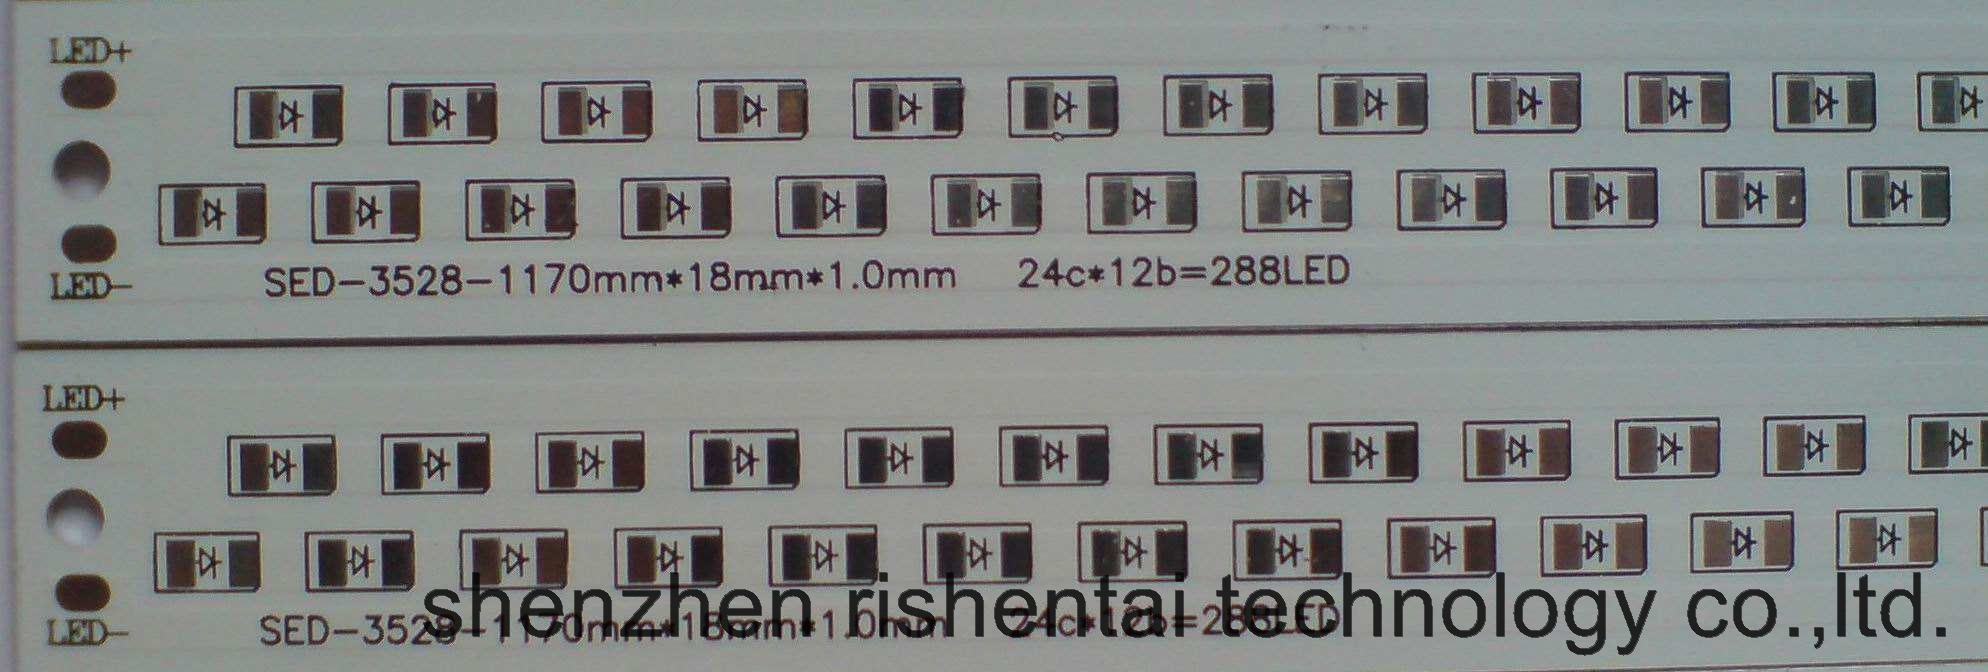 Printed Circuit Board LED PCB Board Aluminum PCB For LED